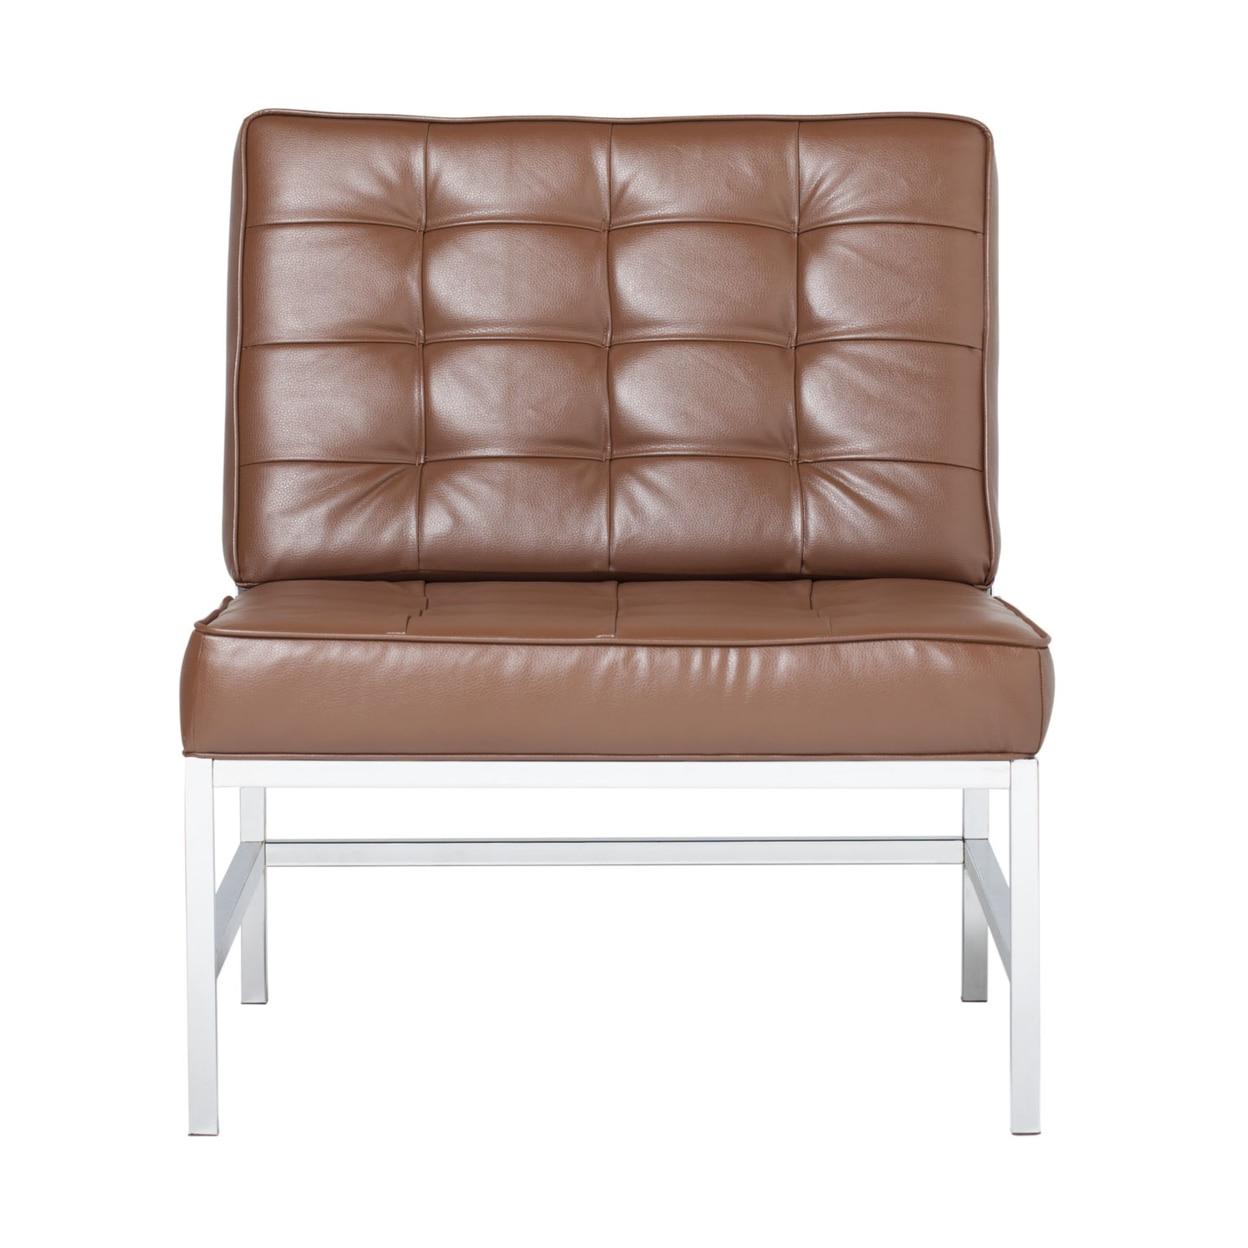 Studio Designs Home Office Ashlar Chair - Walnut